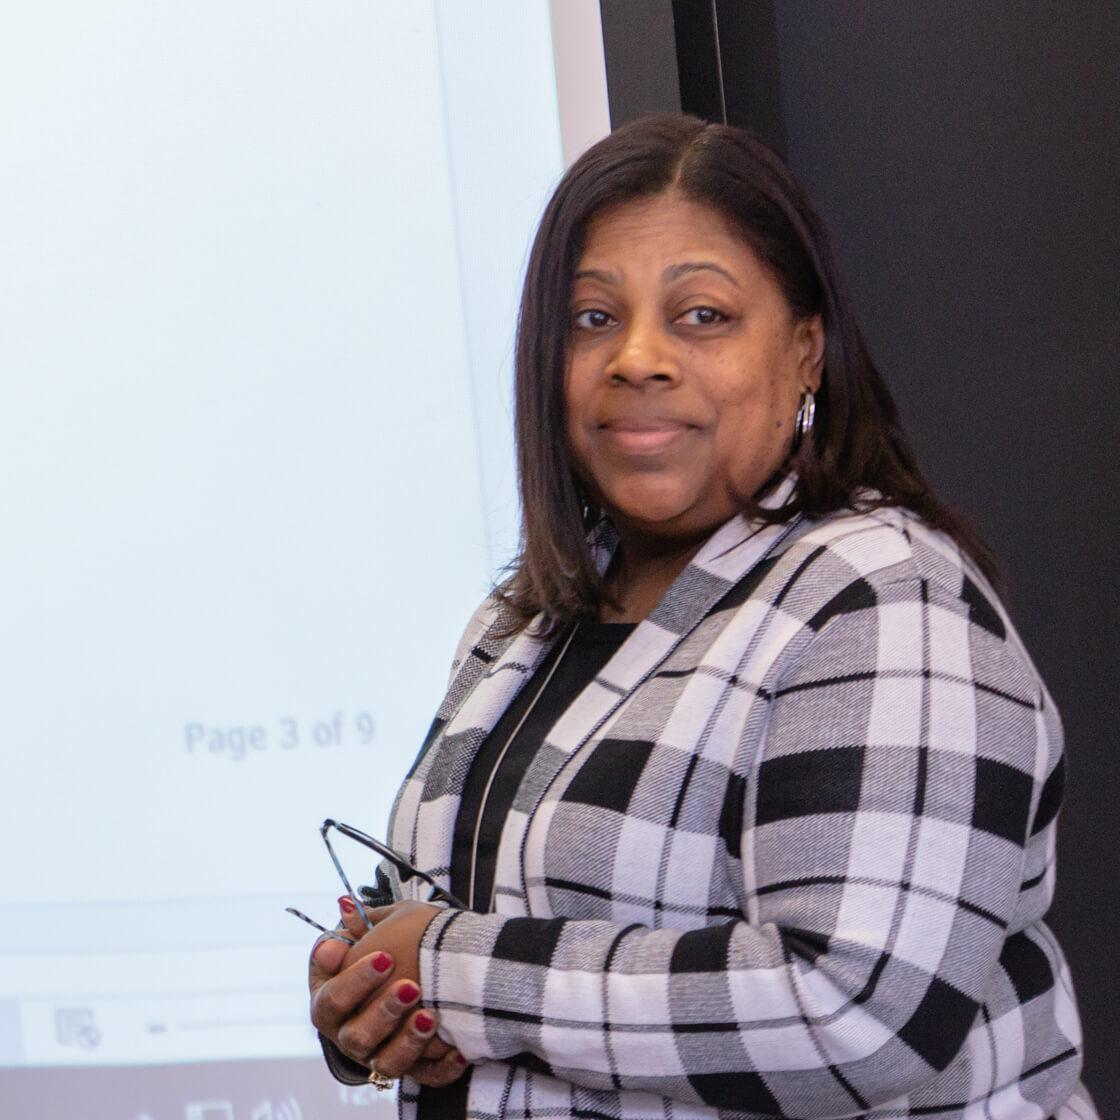 Professor Lavetta Ross teaching near a projector